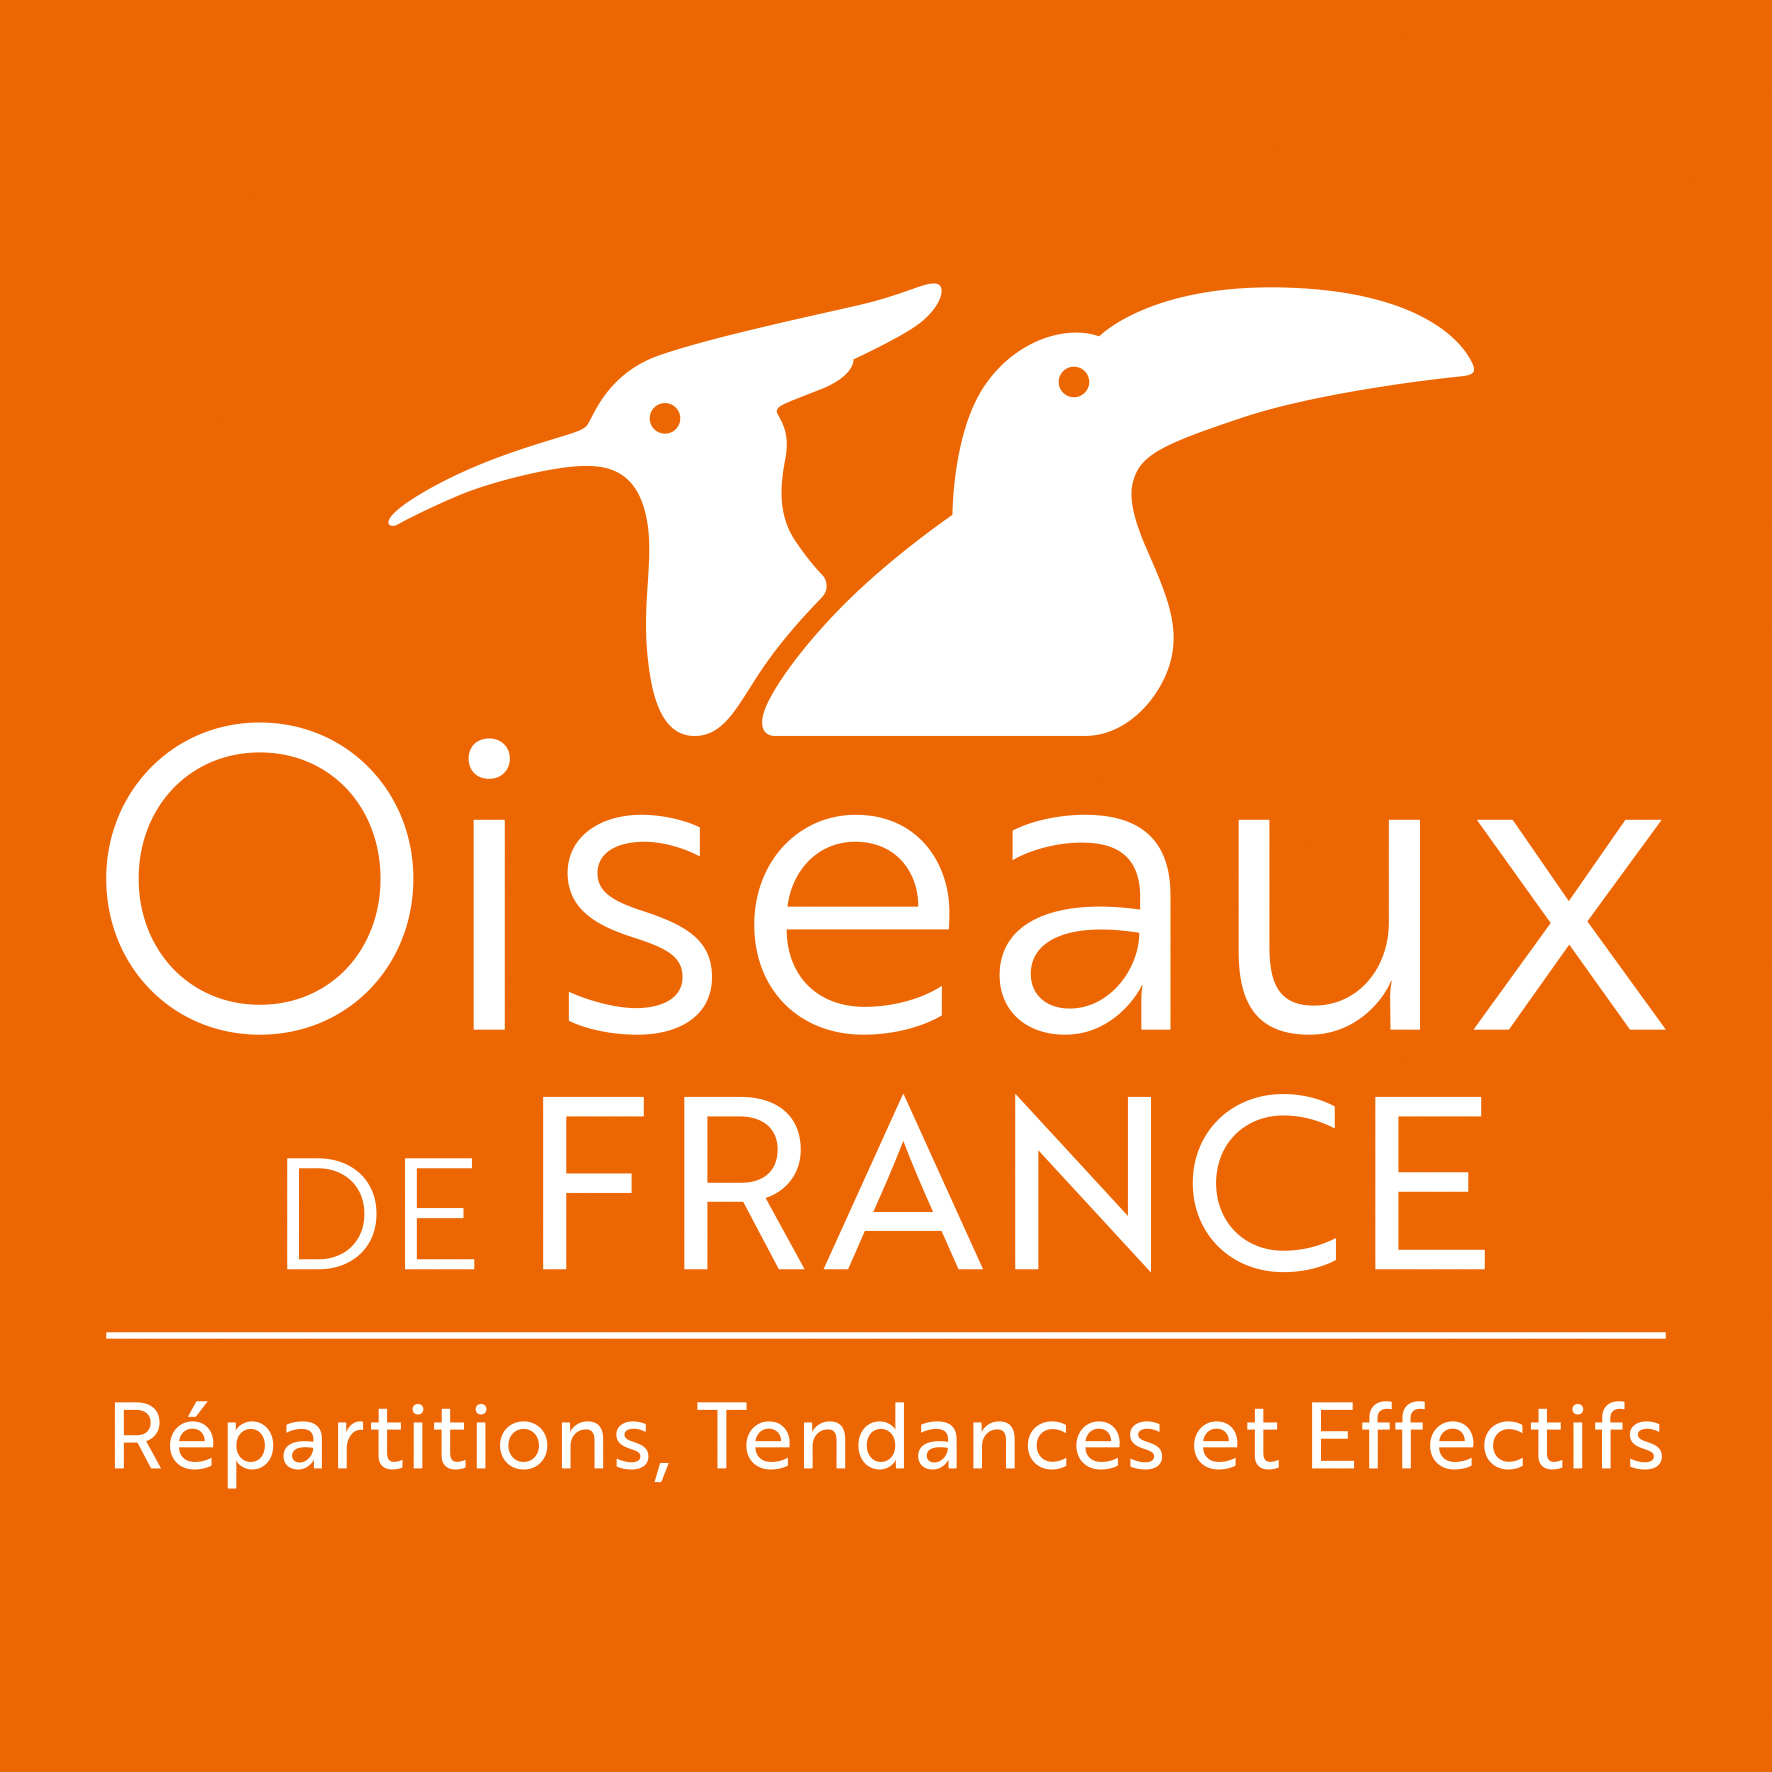 https://cdnfiles1.biolovision.net/www.faune-guyane.fr/userfiles/Documentsdivers/Oiseaux/logoOiseauxDeFrancefondorange.jpg